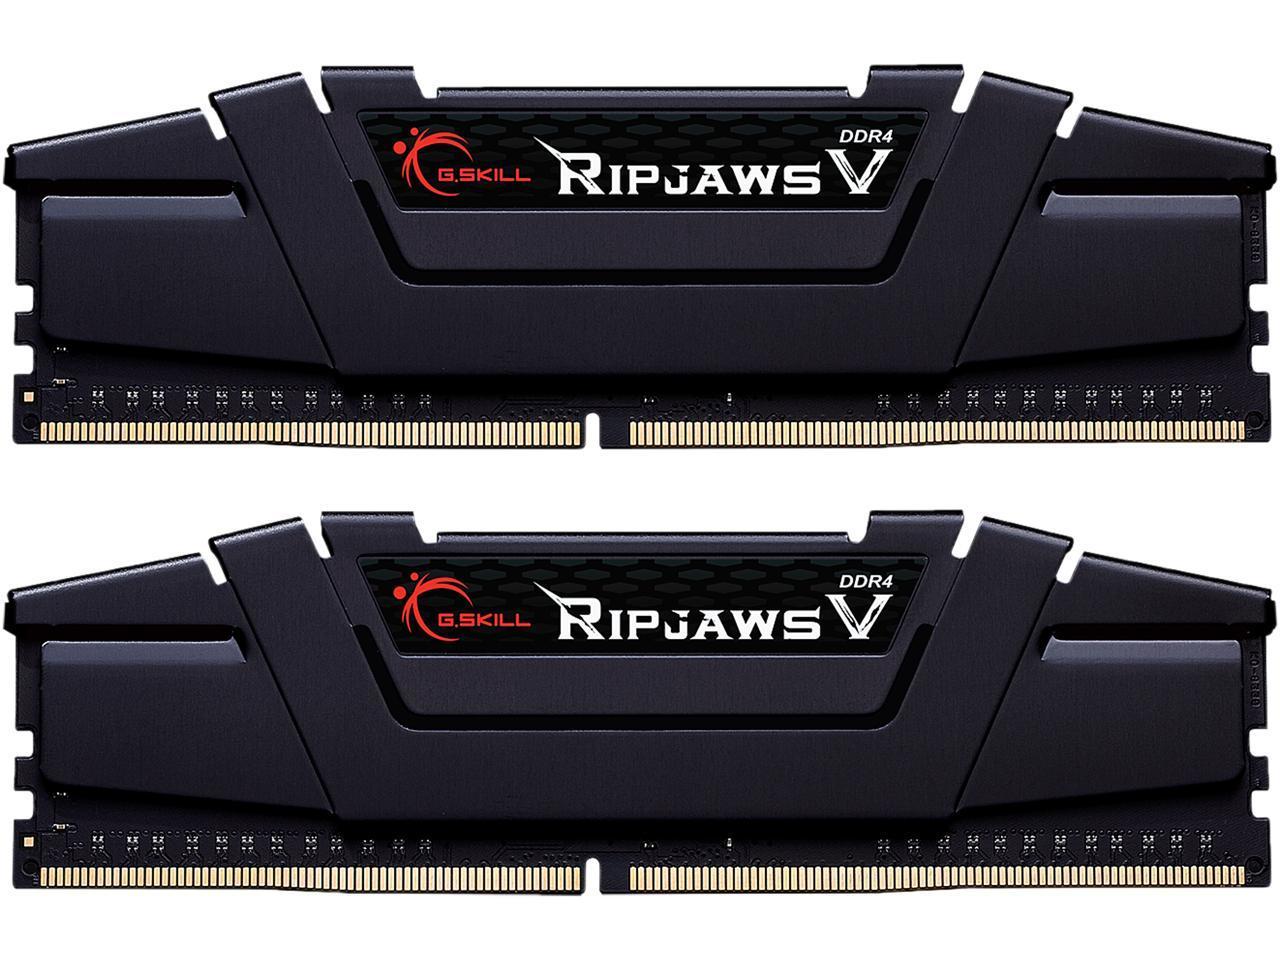 32GB (2x 16) G.SKILL Ripjaws V Series DDR4 3600 Desktop RAM kit @Newegg $140